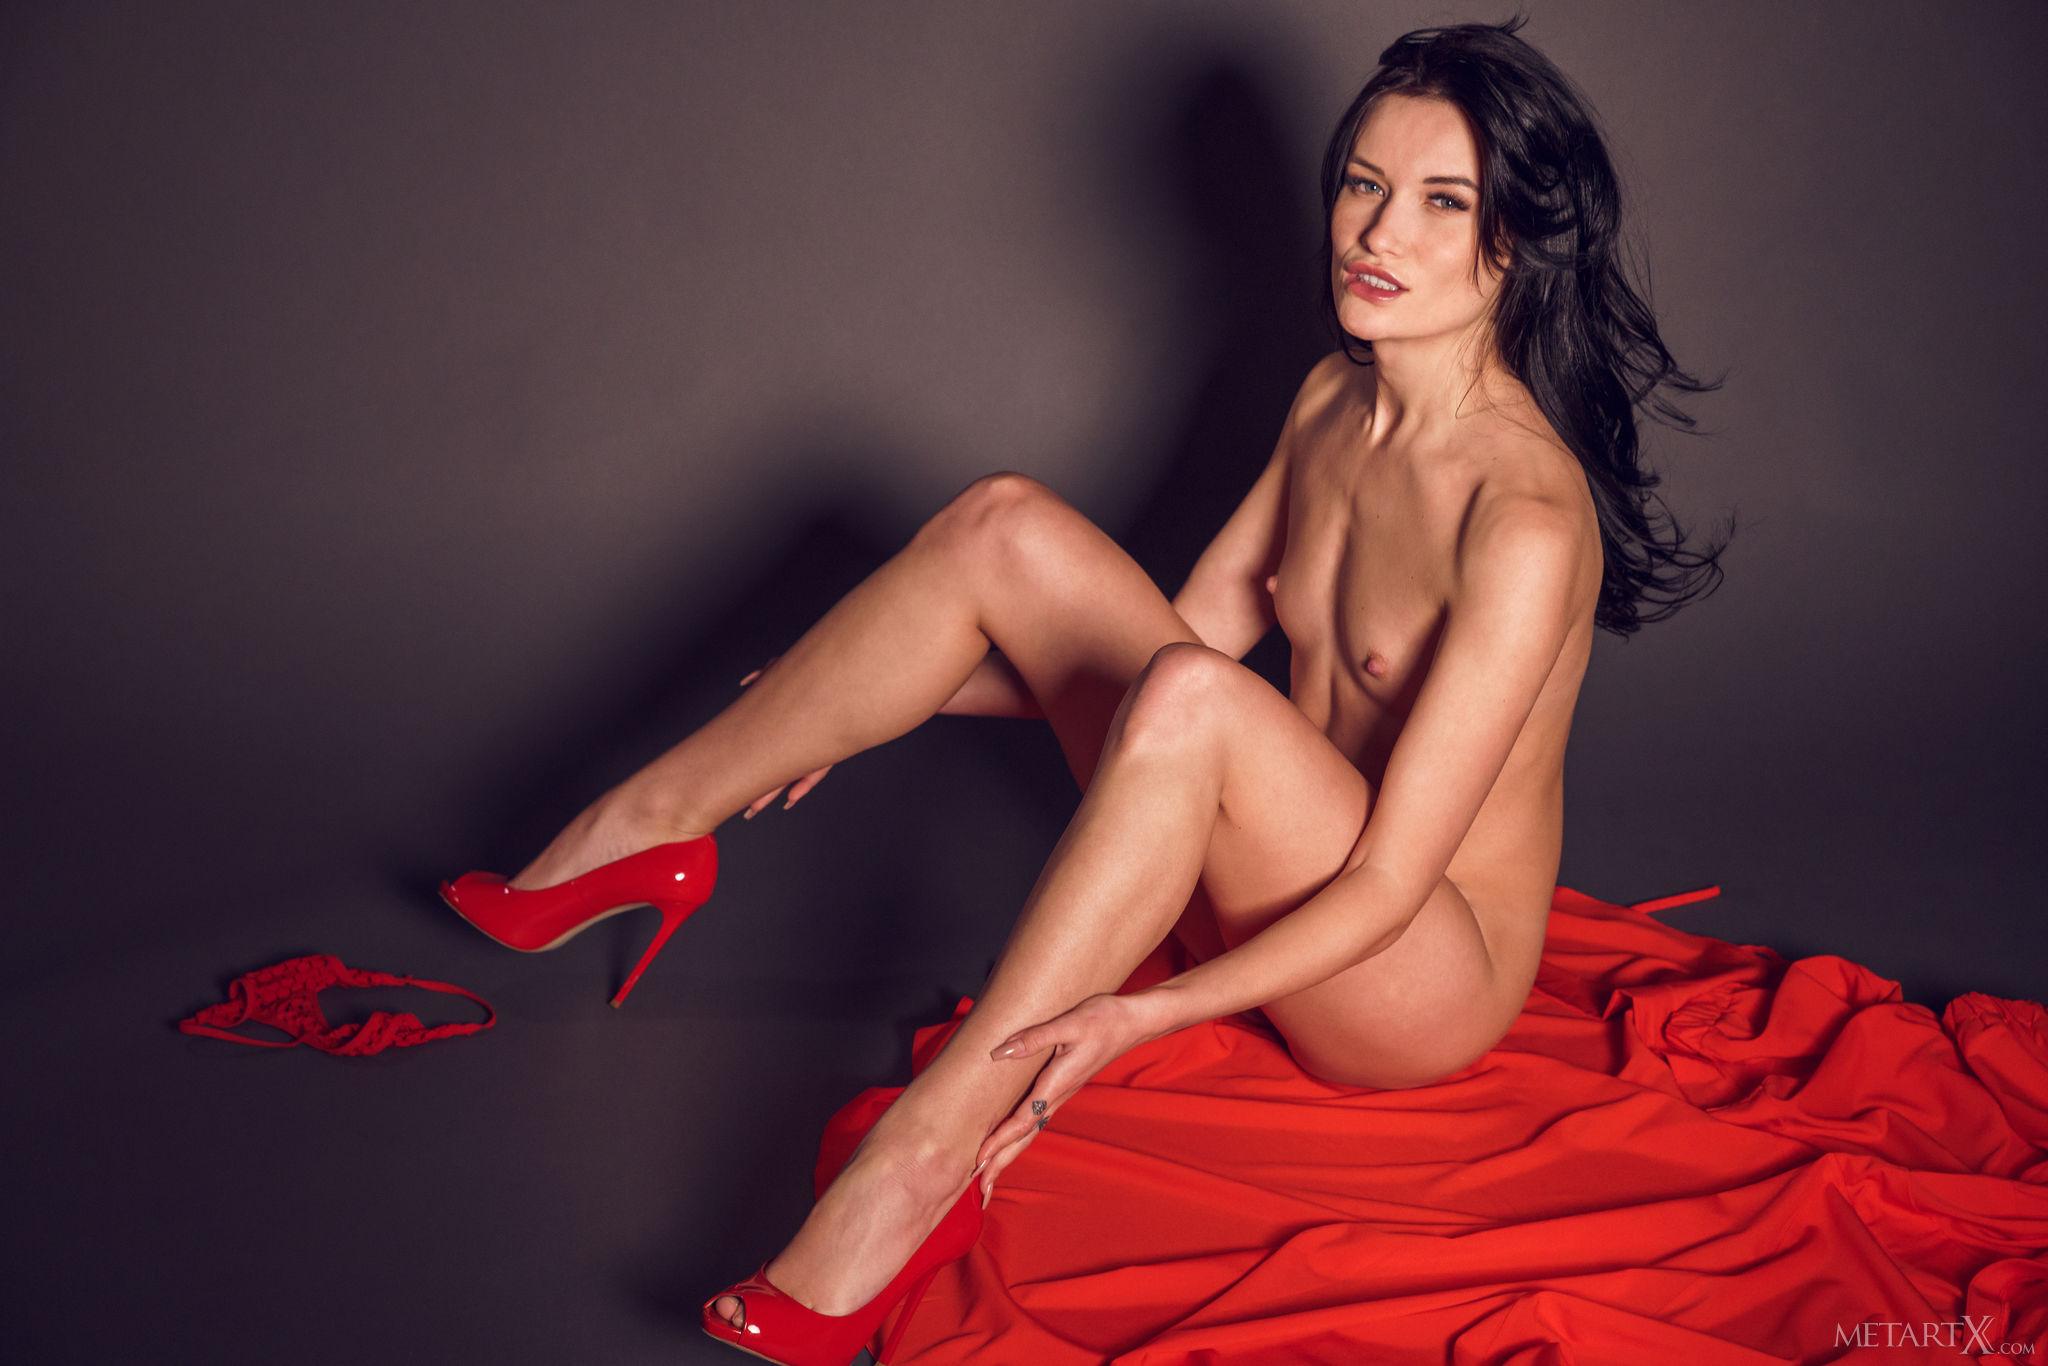 The red dress manuela eccli